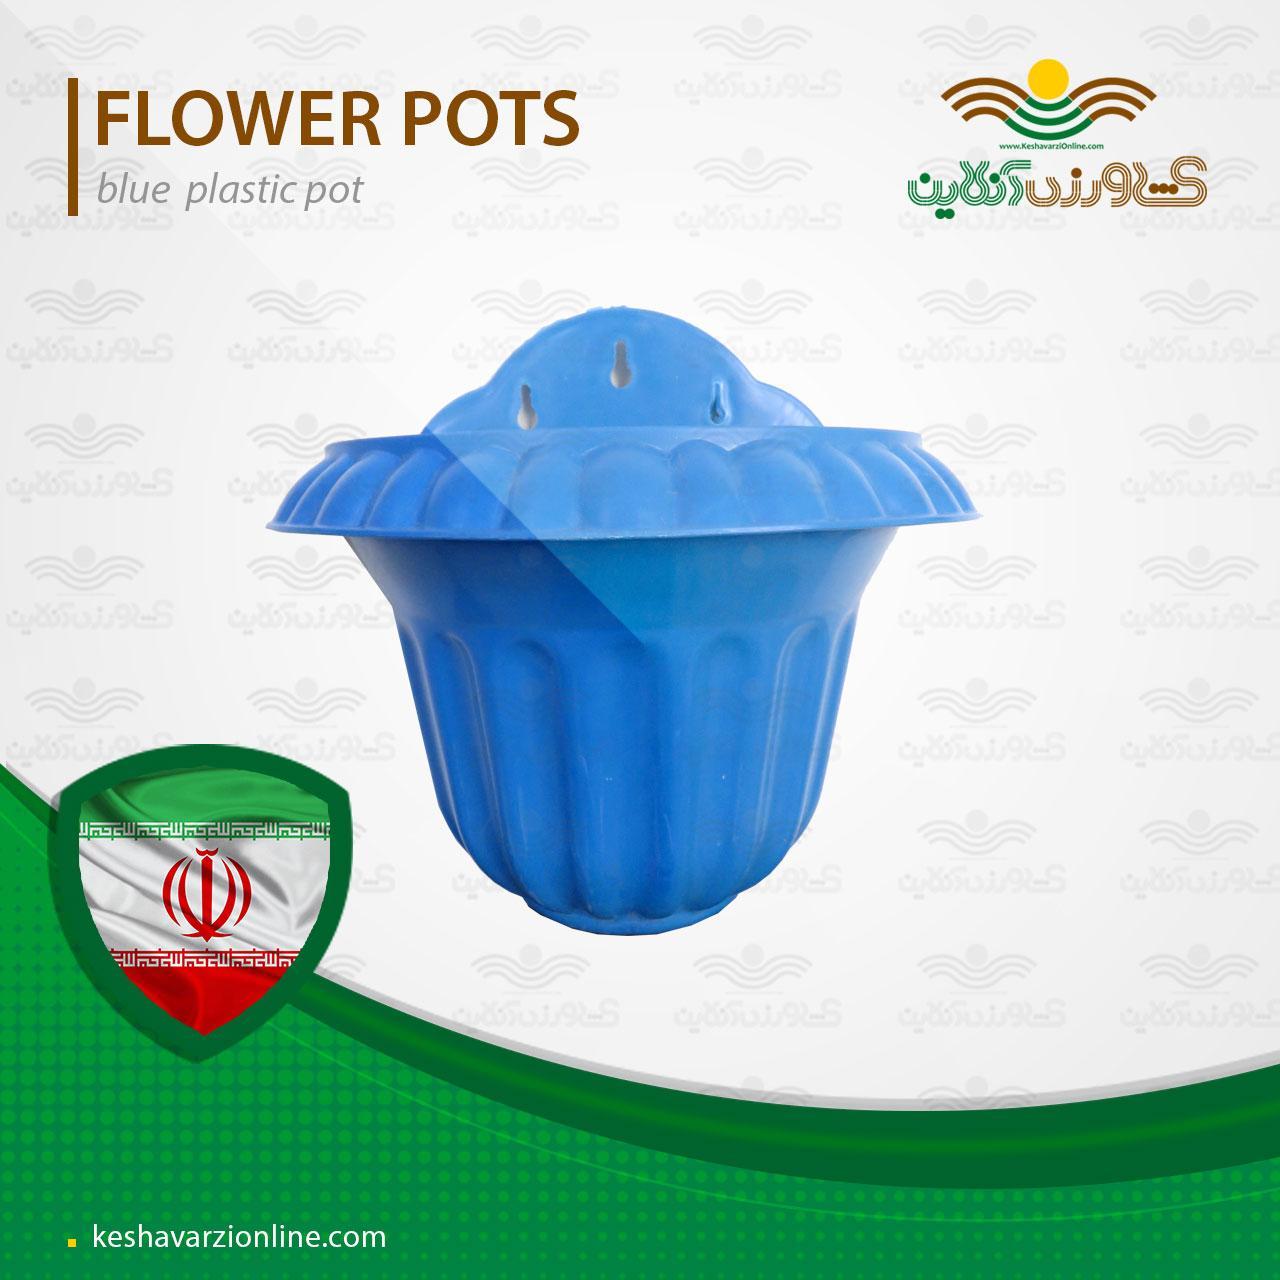 فروش گلدان دیواری پلاستیکی آبی